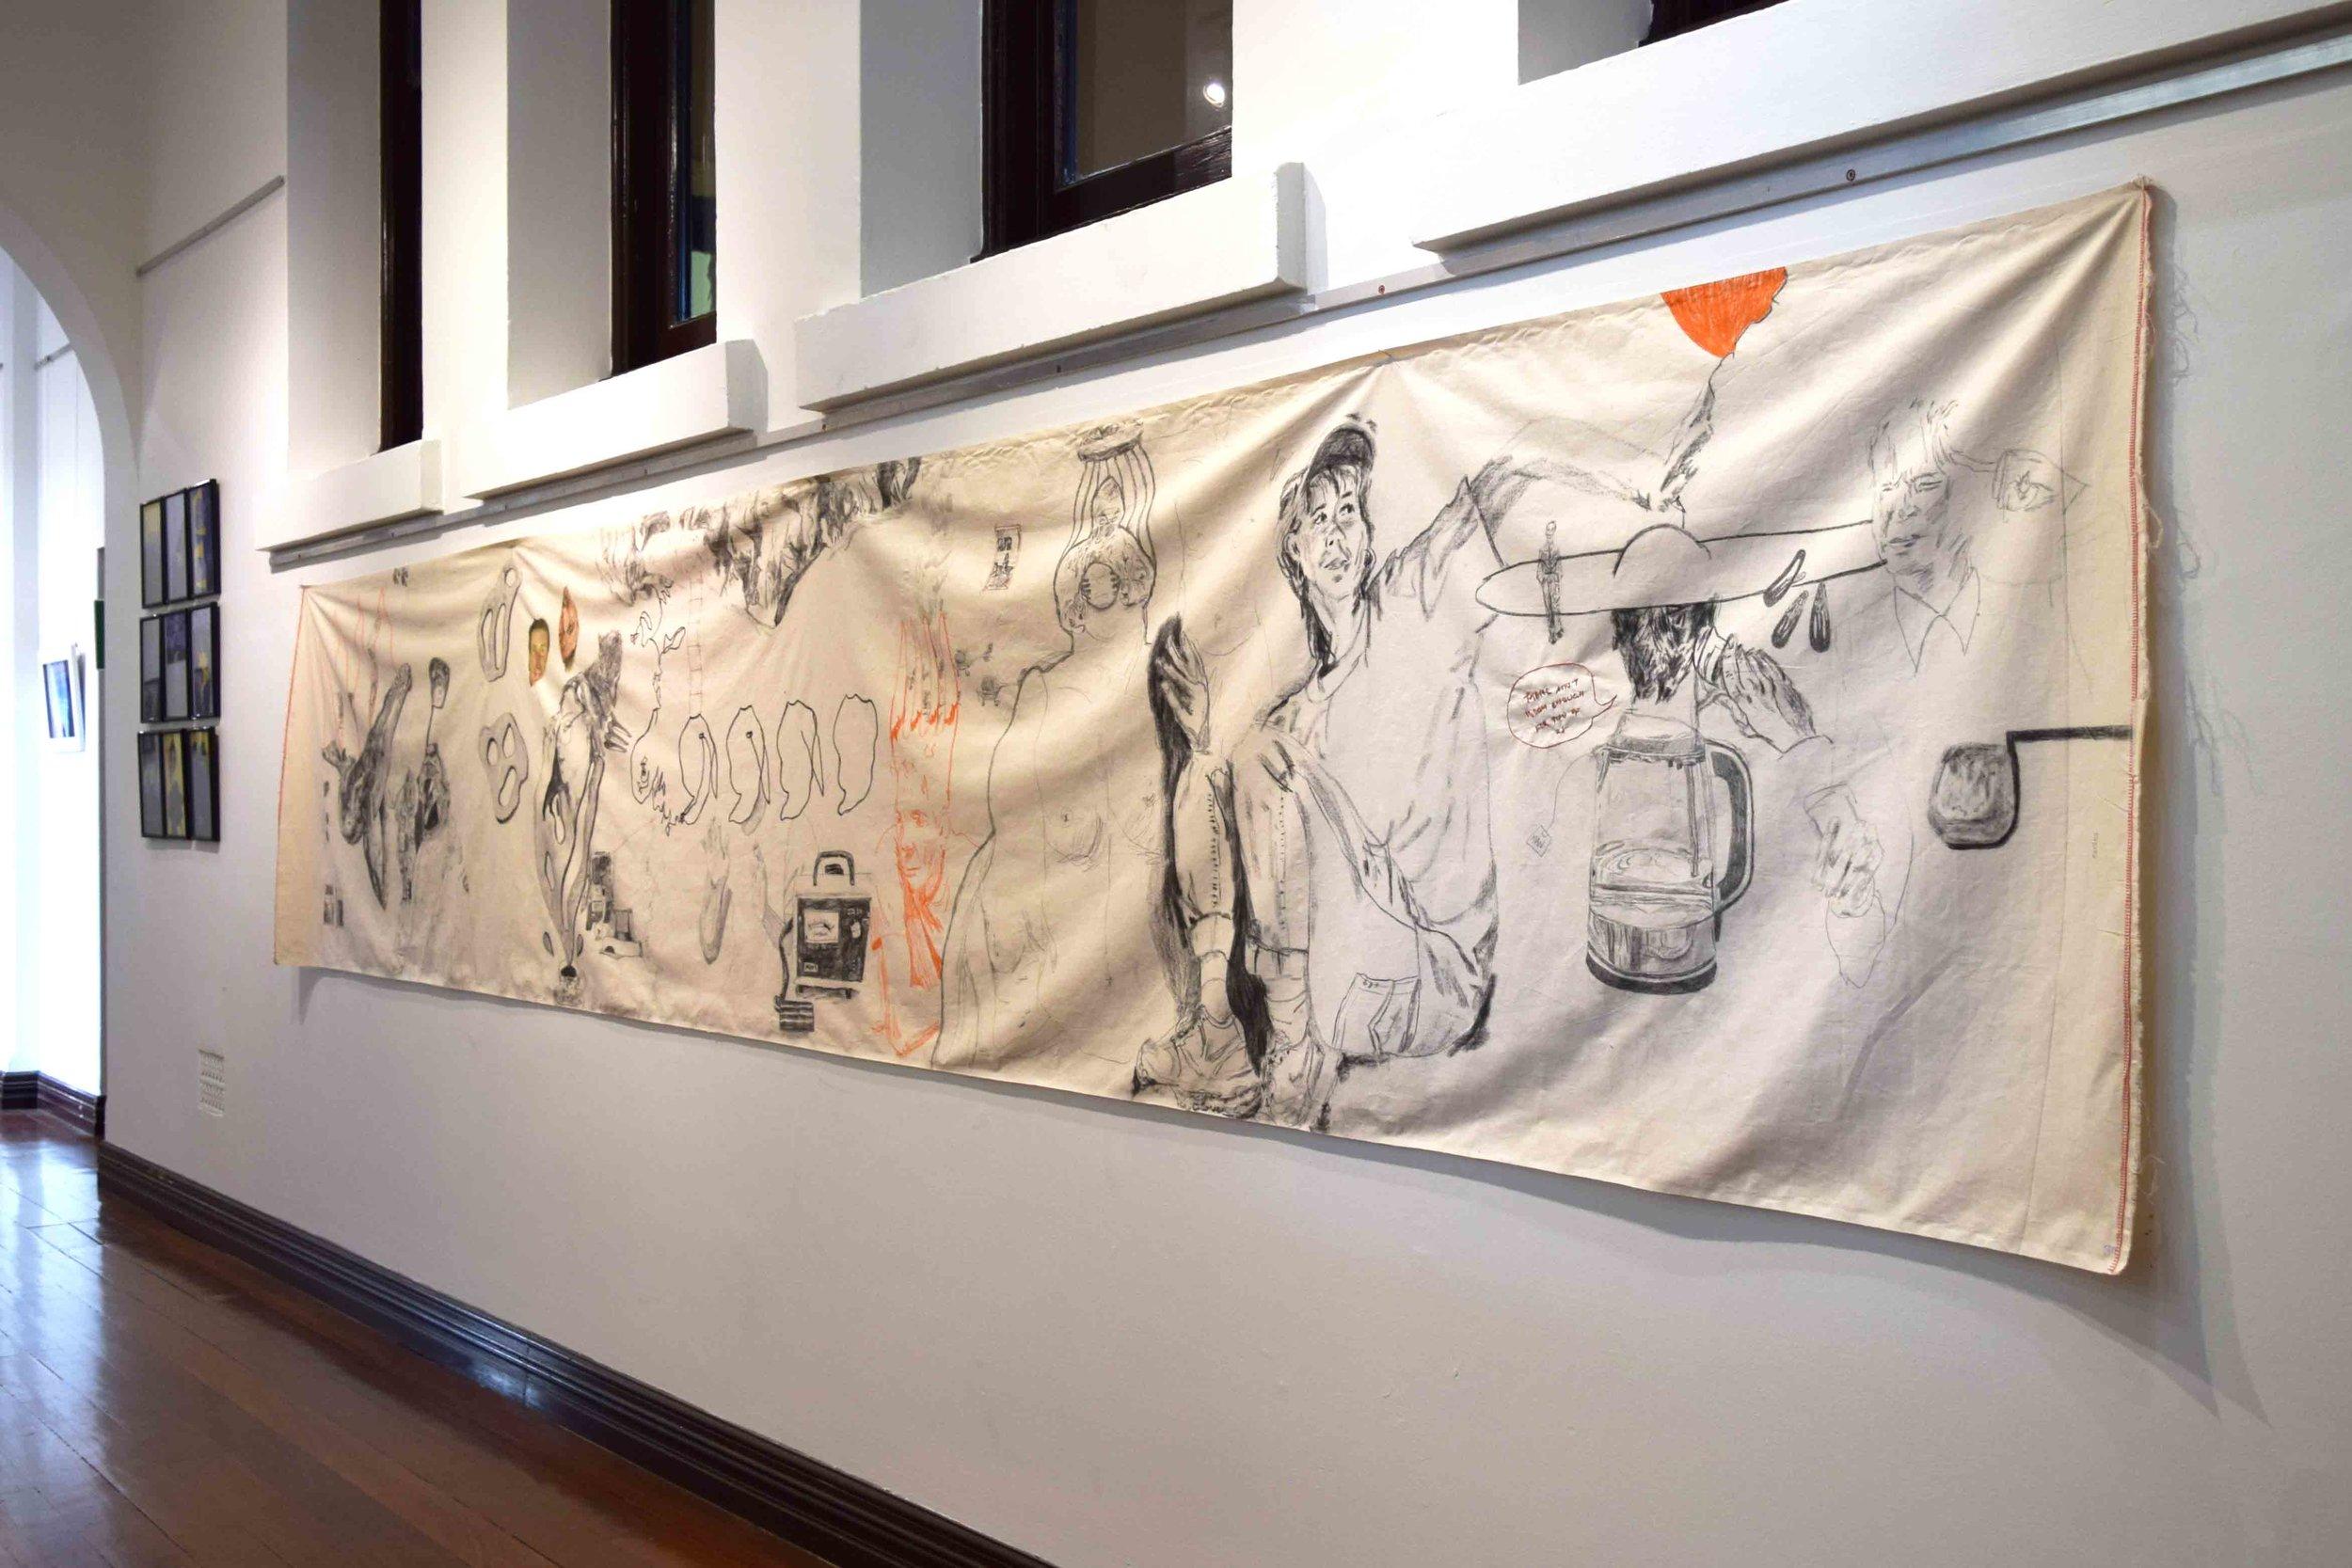 73. Zoe Sydney,  Image Storage Mechanisim (large) , mixed media drawing on cotton, 490 x 95 cm $500  WINNER - OVERALL WINNER - TRADITIONAL MEDIA